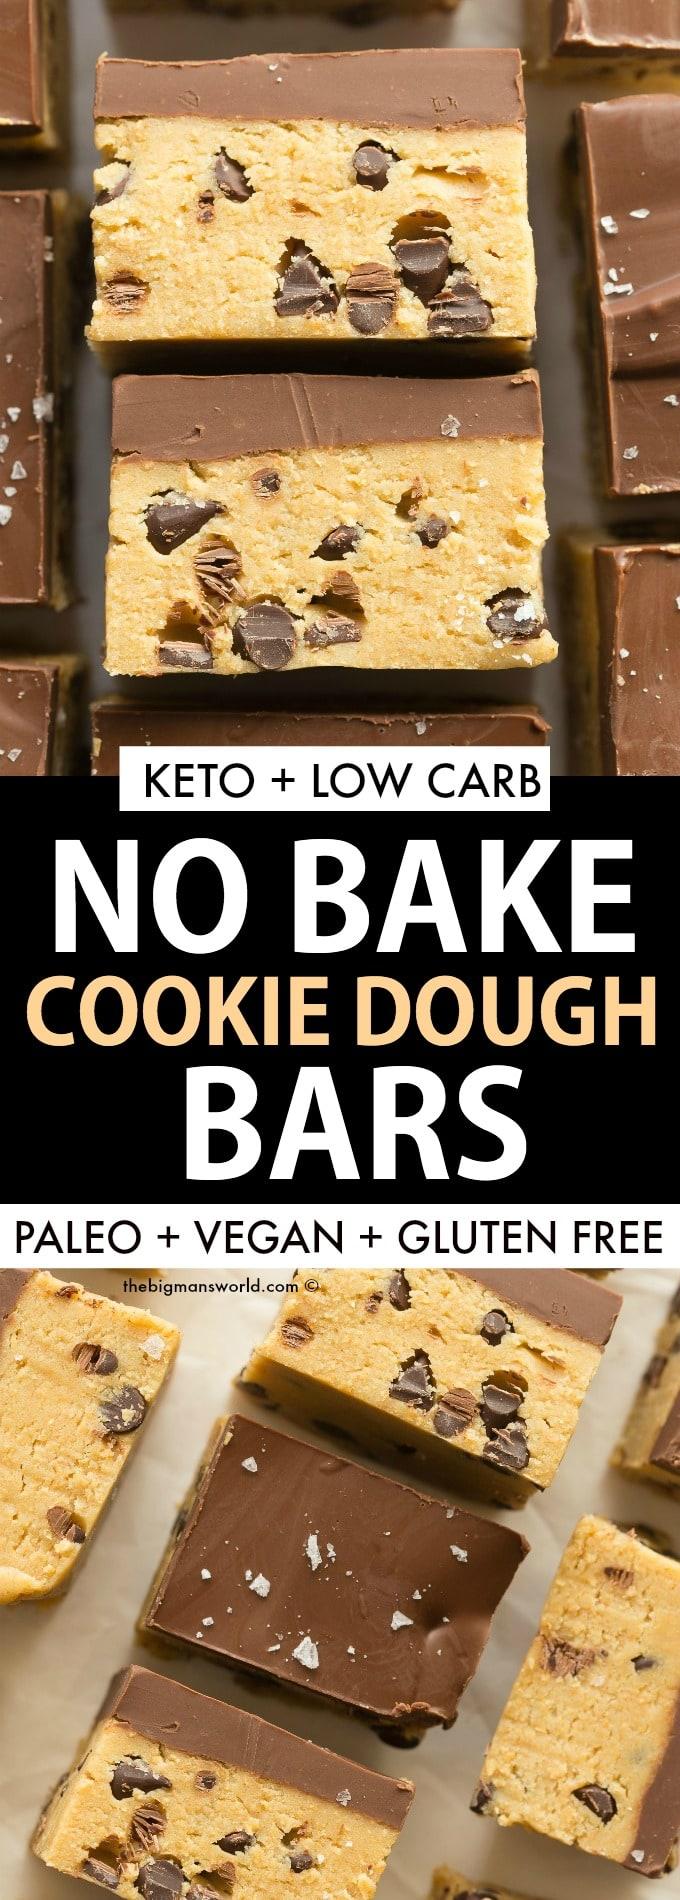 Keto No Bake Cookie Dough Bars with sugar free chocolate chips